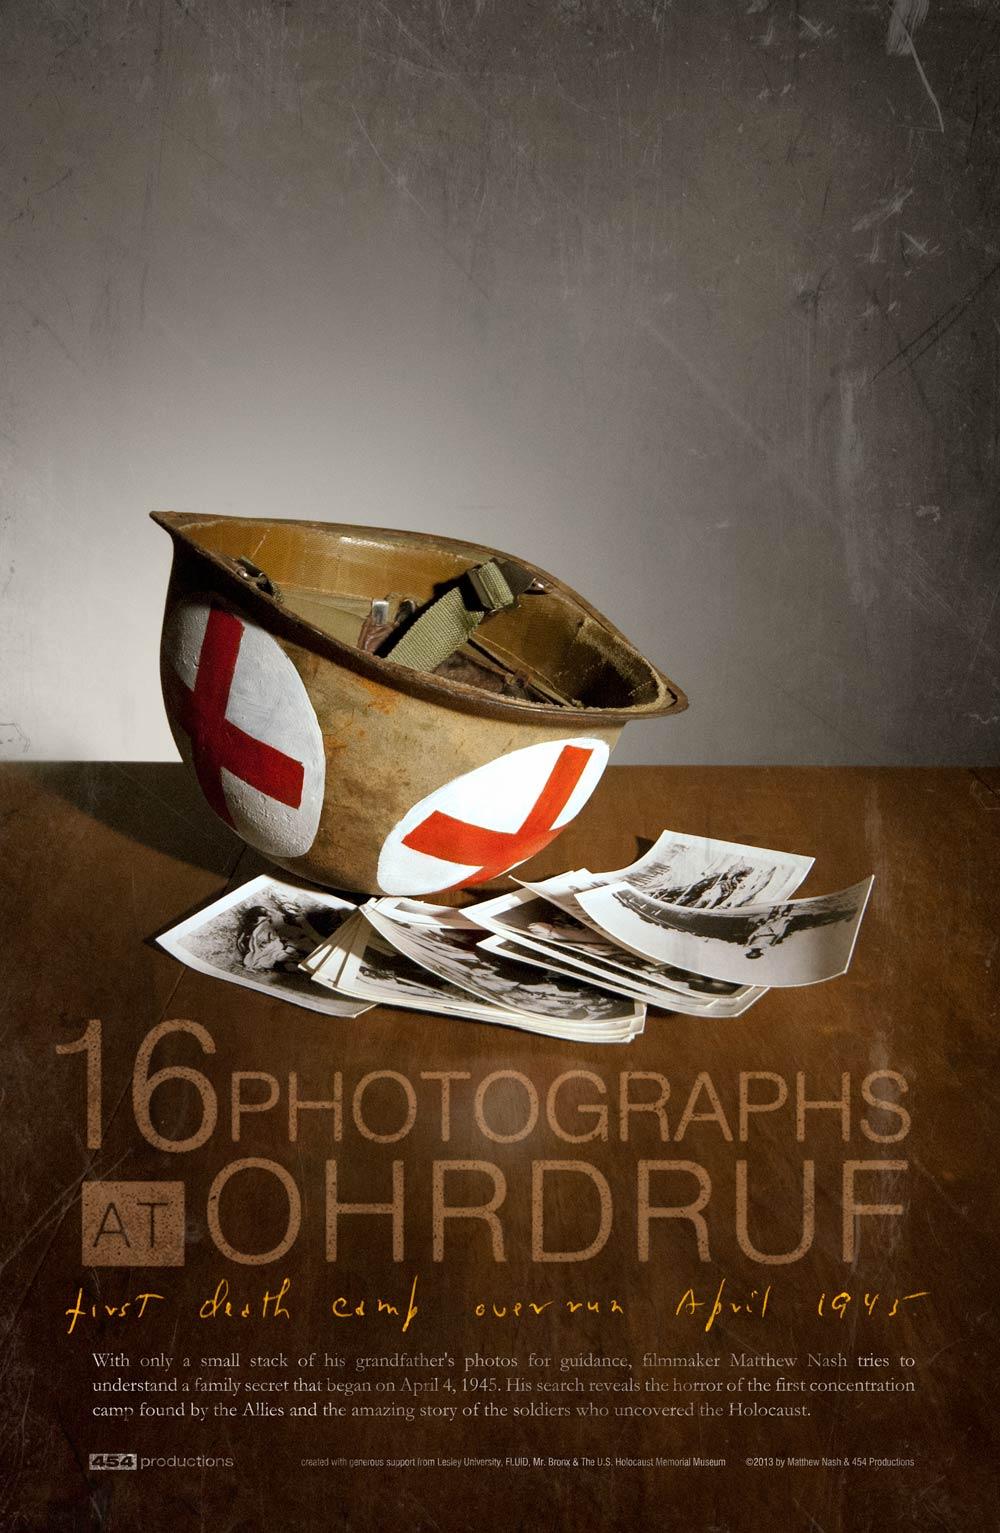 16 Photographs